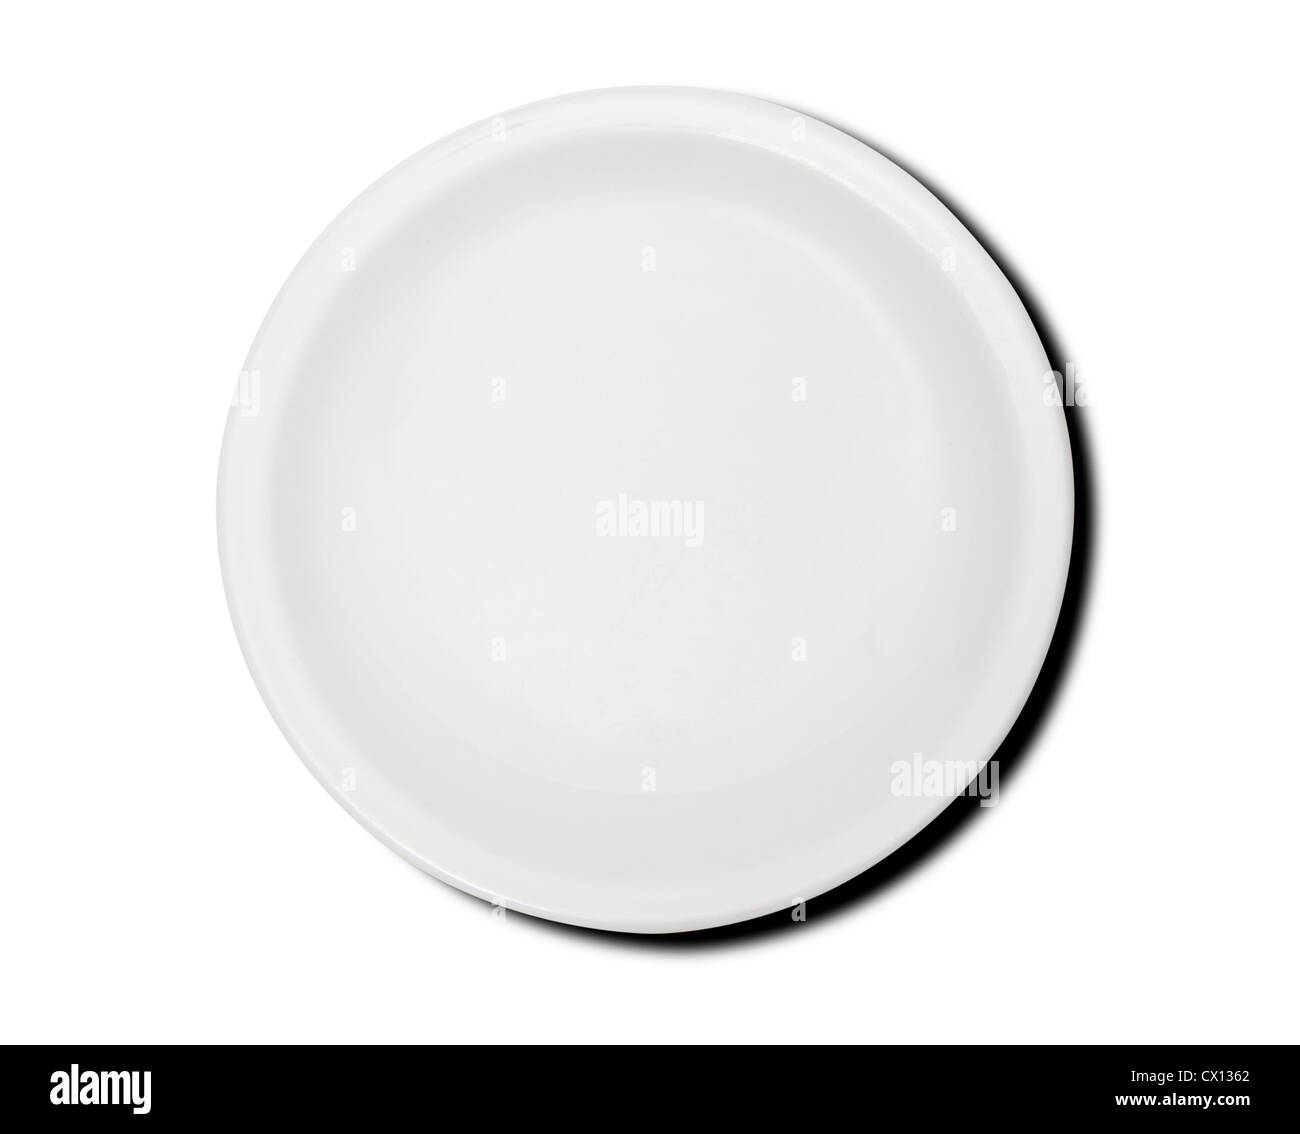 Empty plate - Stock Image